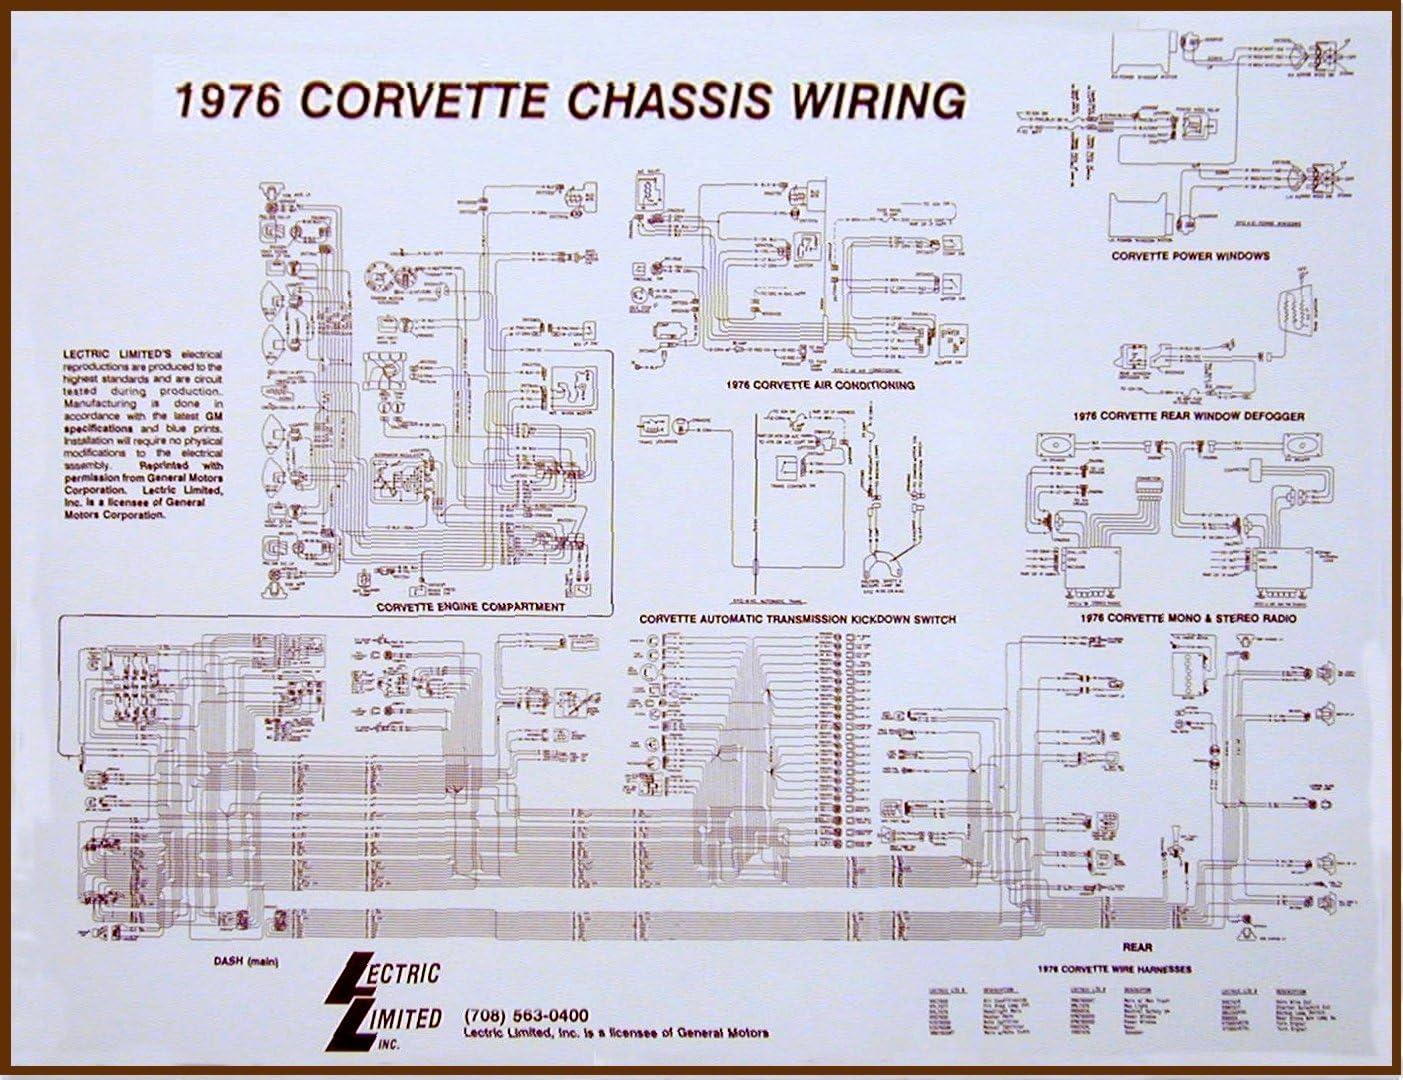 1975 corvette ignition wiring diagram | mile-pattern wiring diagram union -  mile-pattern.buildingblocks2016.eu  buildingblocks2016.eu